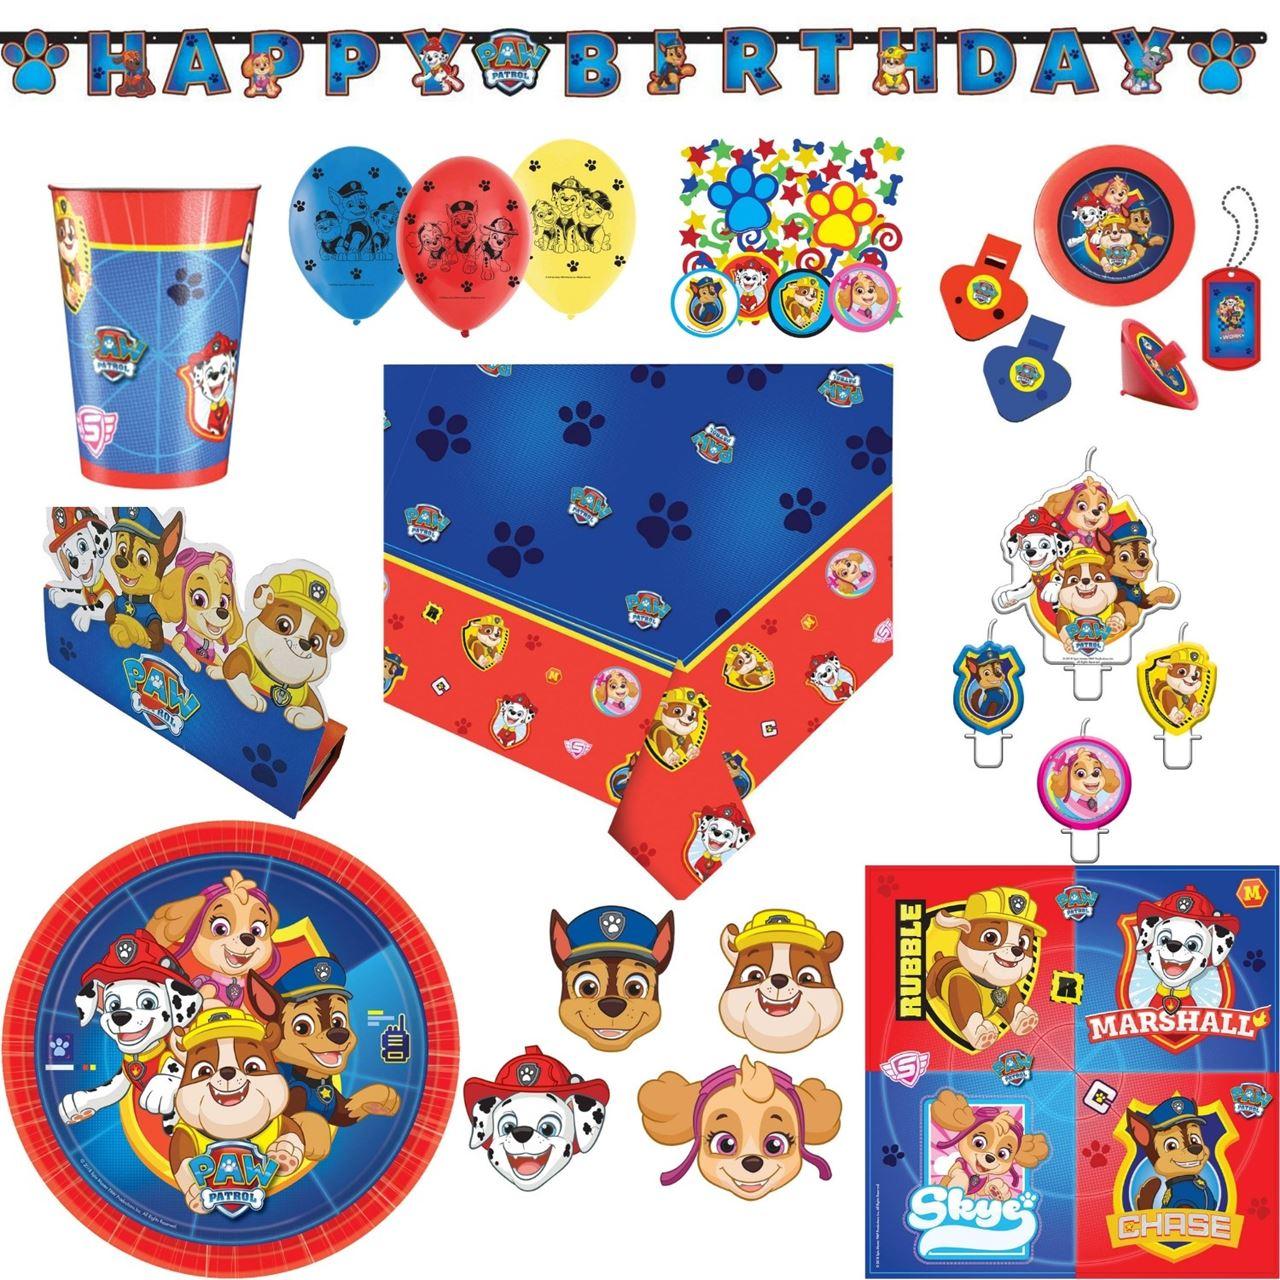 24 Teile AMSCAN 9903837 Spielzeug-Set Paw Patrol